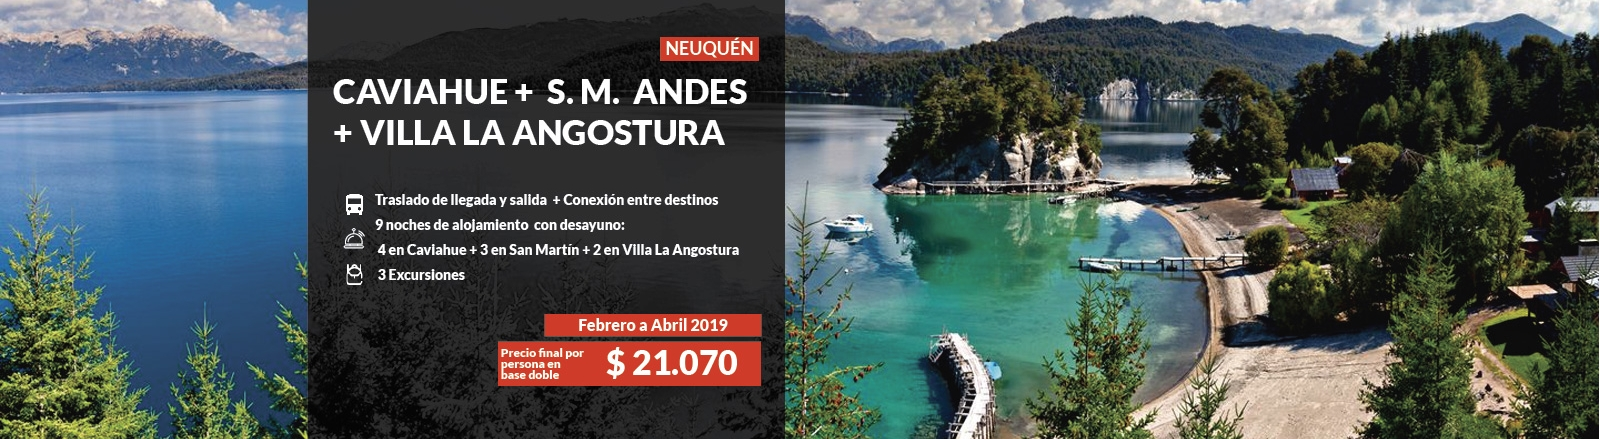 Caviahue, San Martin & Villa La Angostura